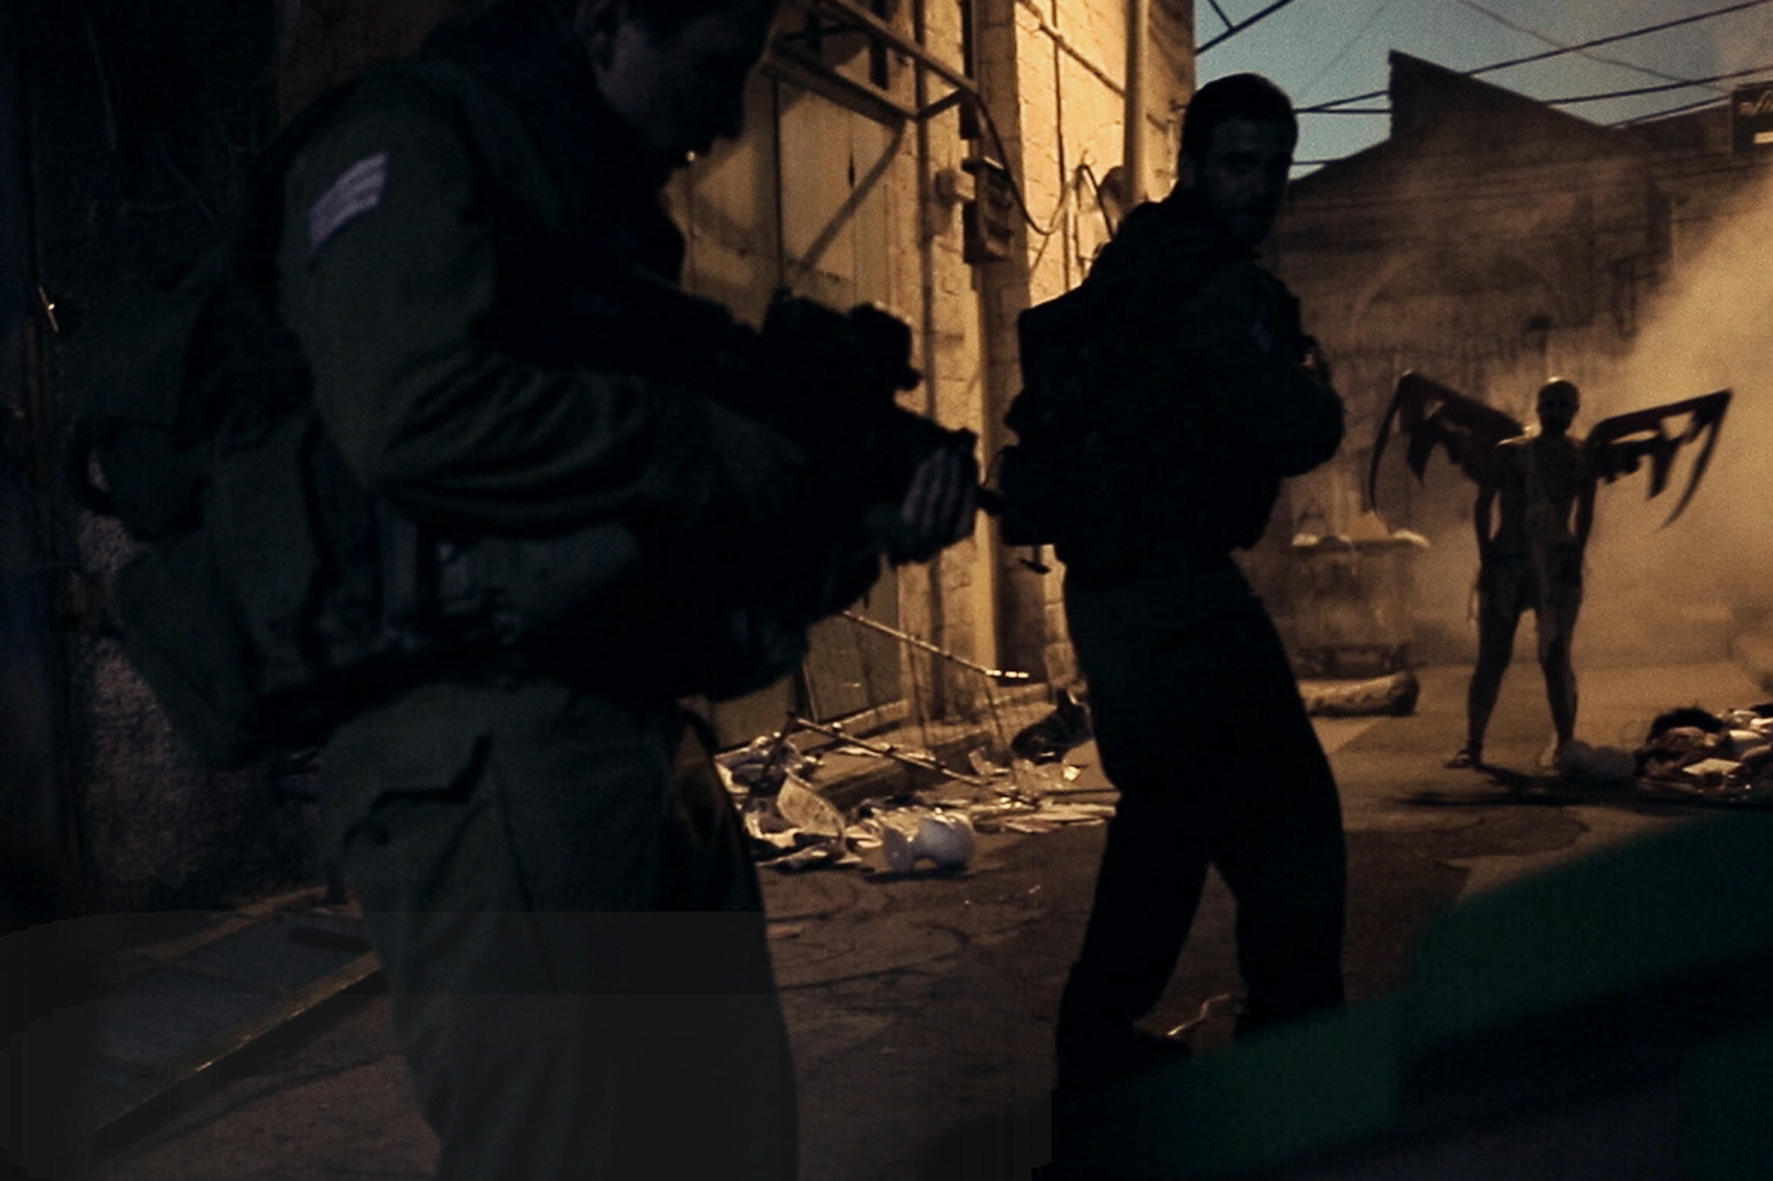 Soldiers vs winged demon figures in Jeruzalem (2015)